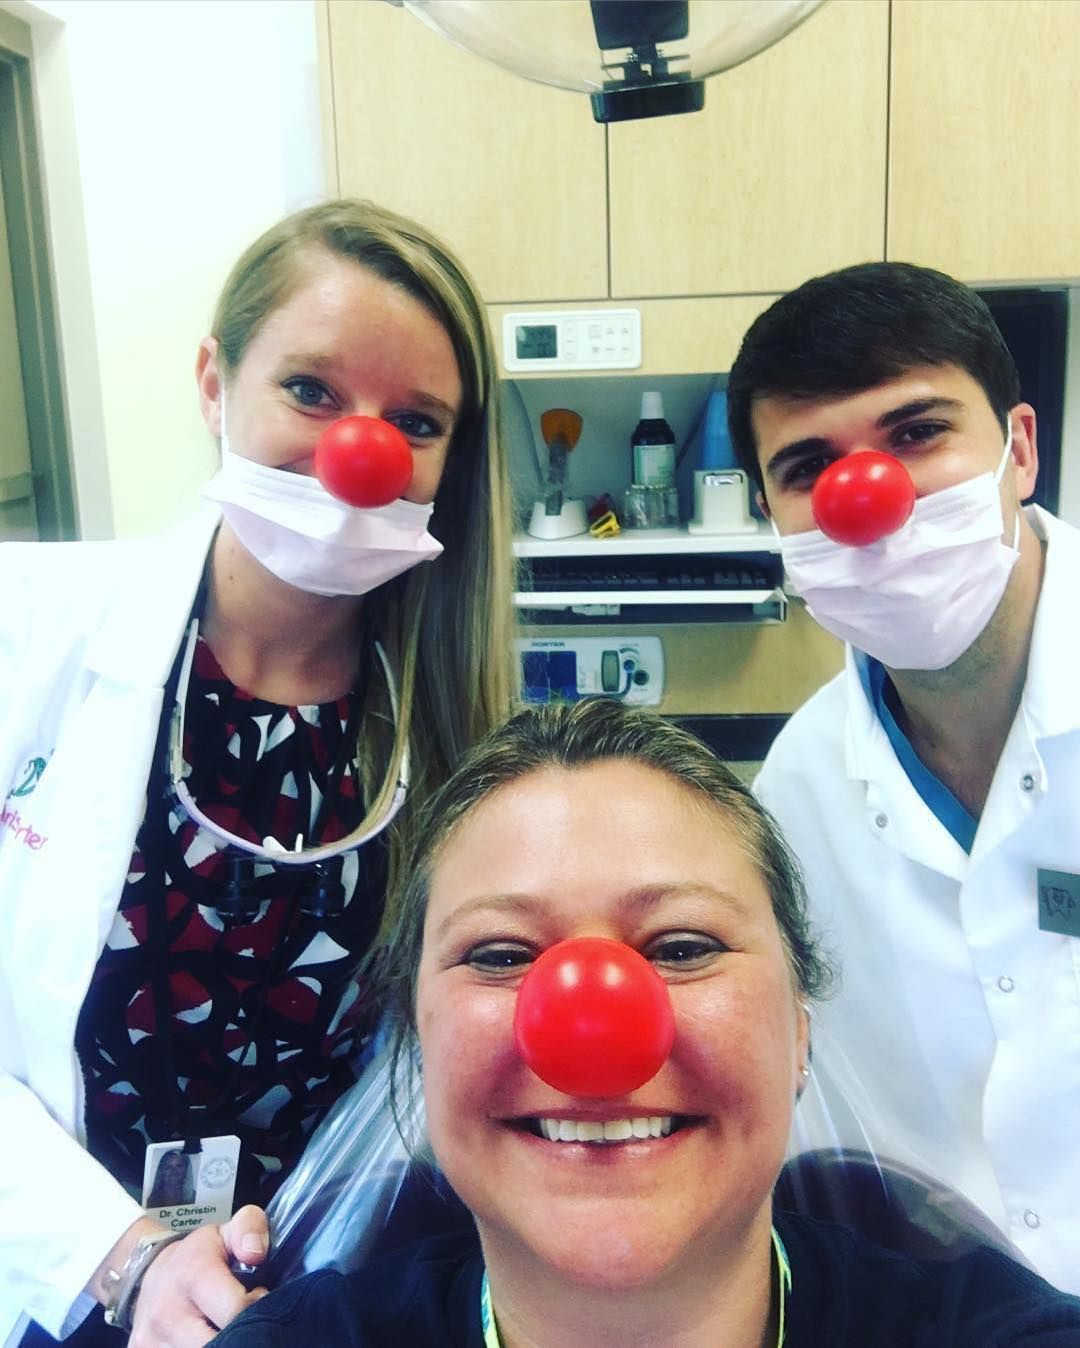 All smiles at the dentist thatus the magic of rednoseday regram